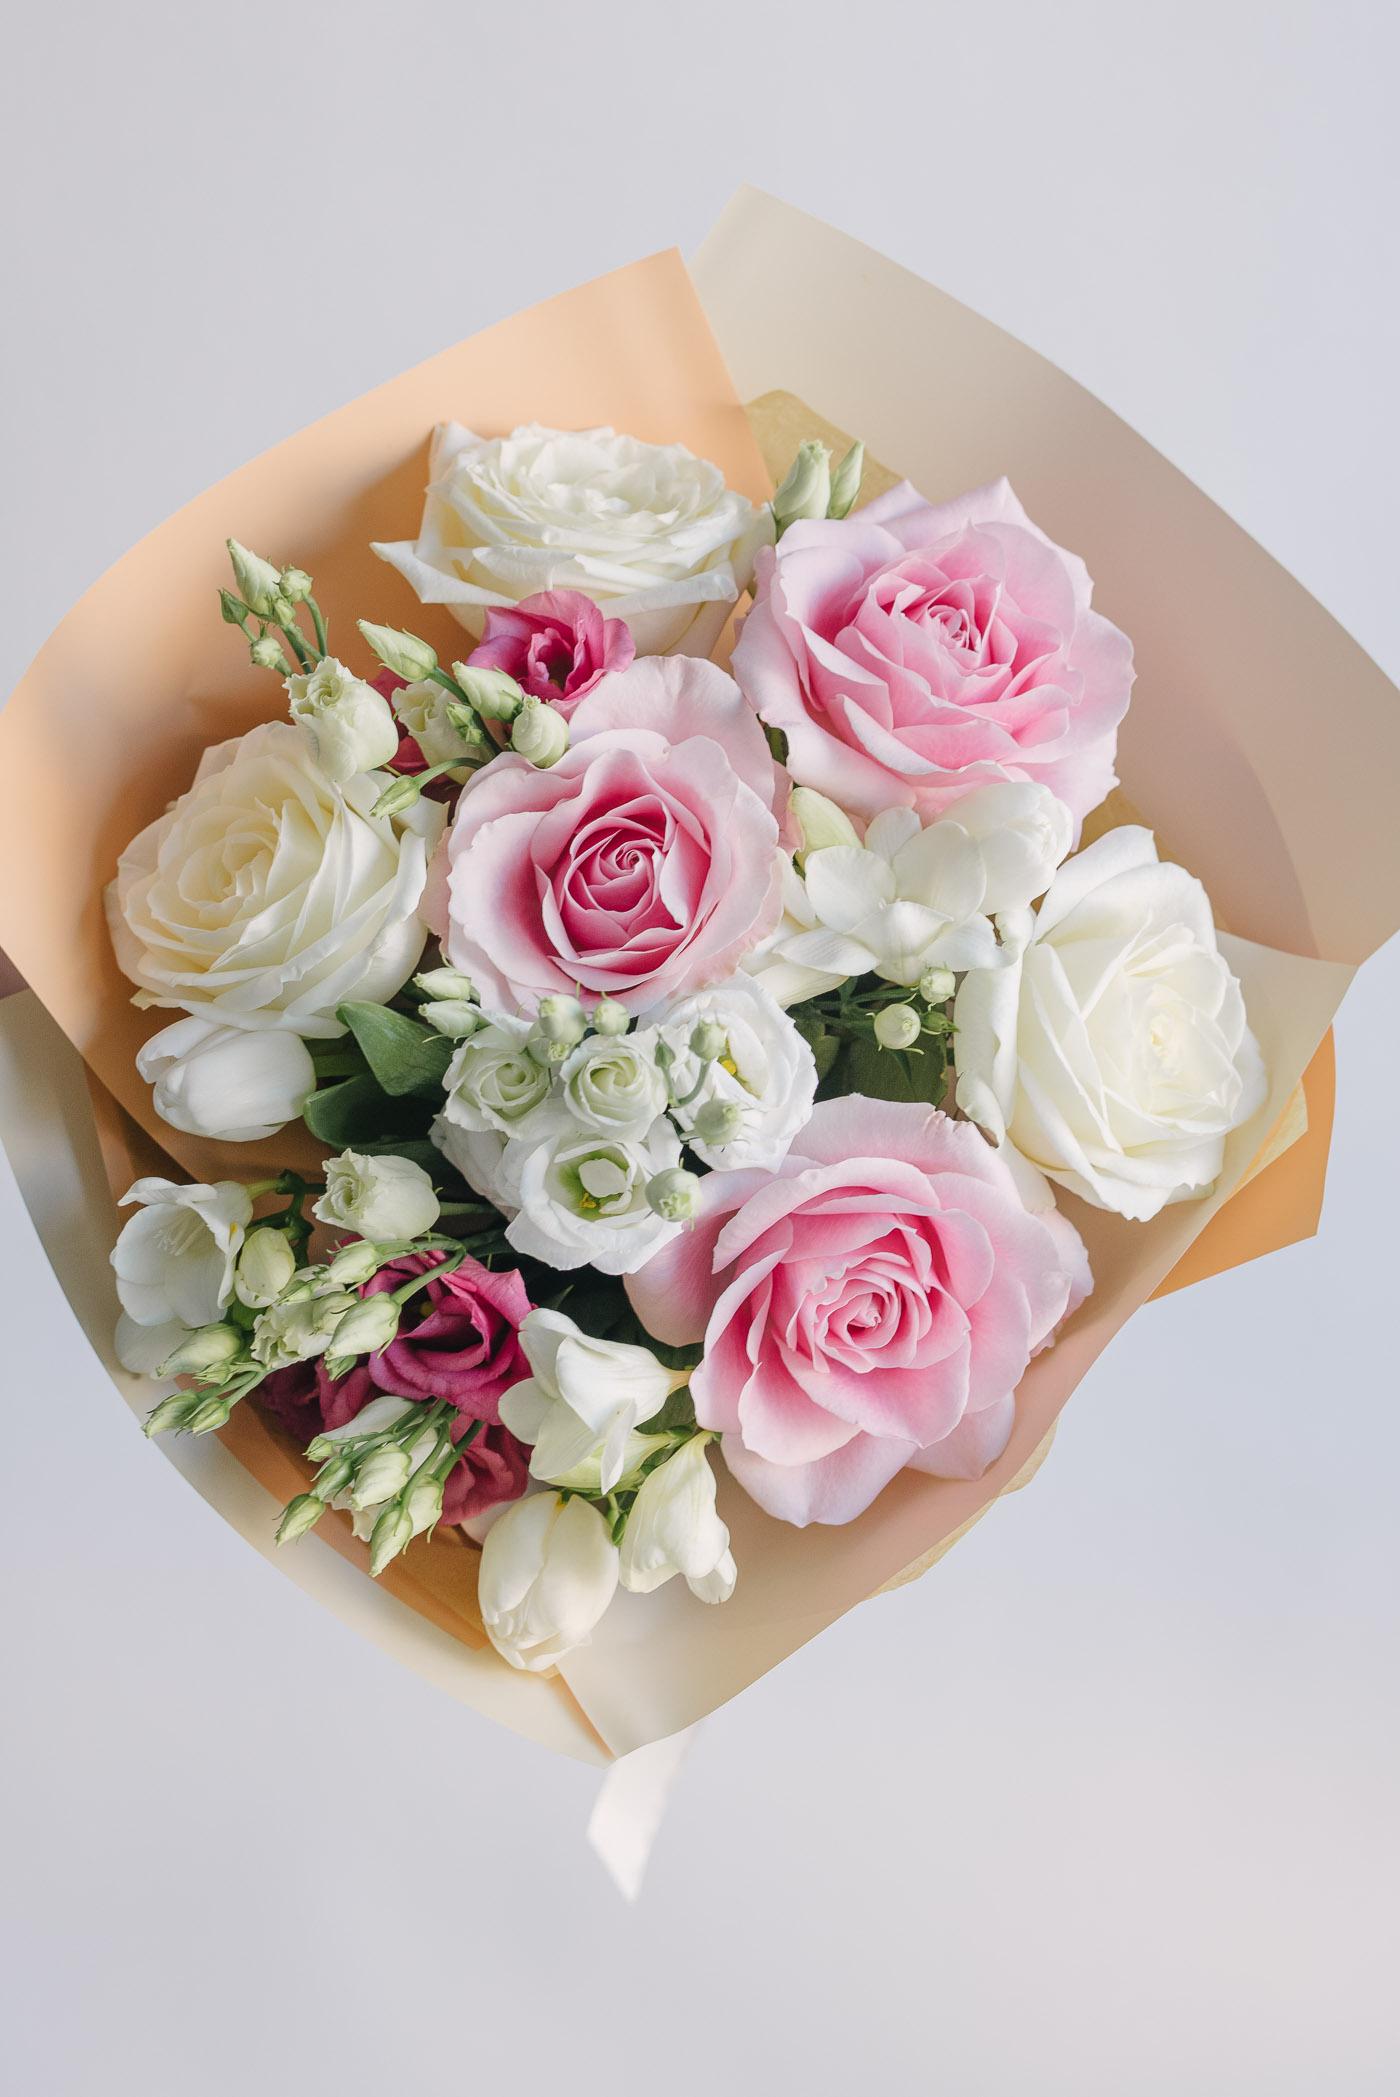 Buchet Cu Trandafiri, Lalele, Lisianthus Si Frezii